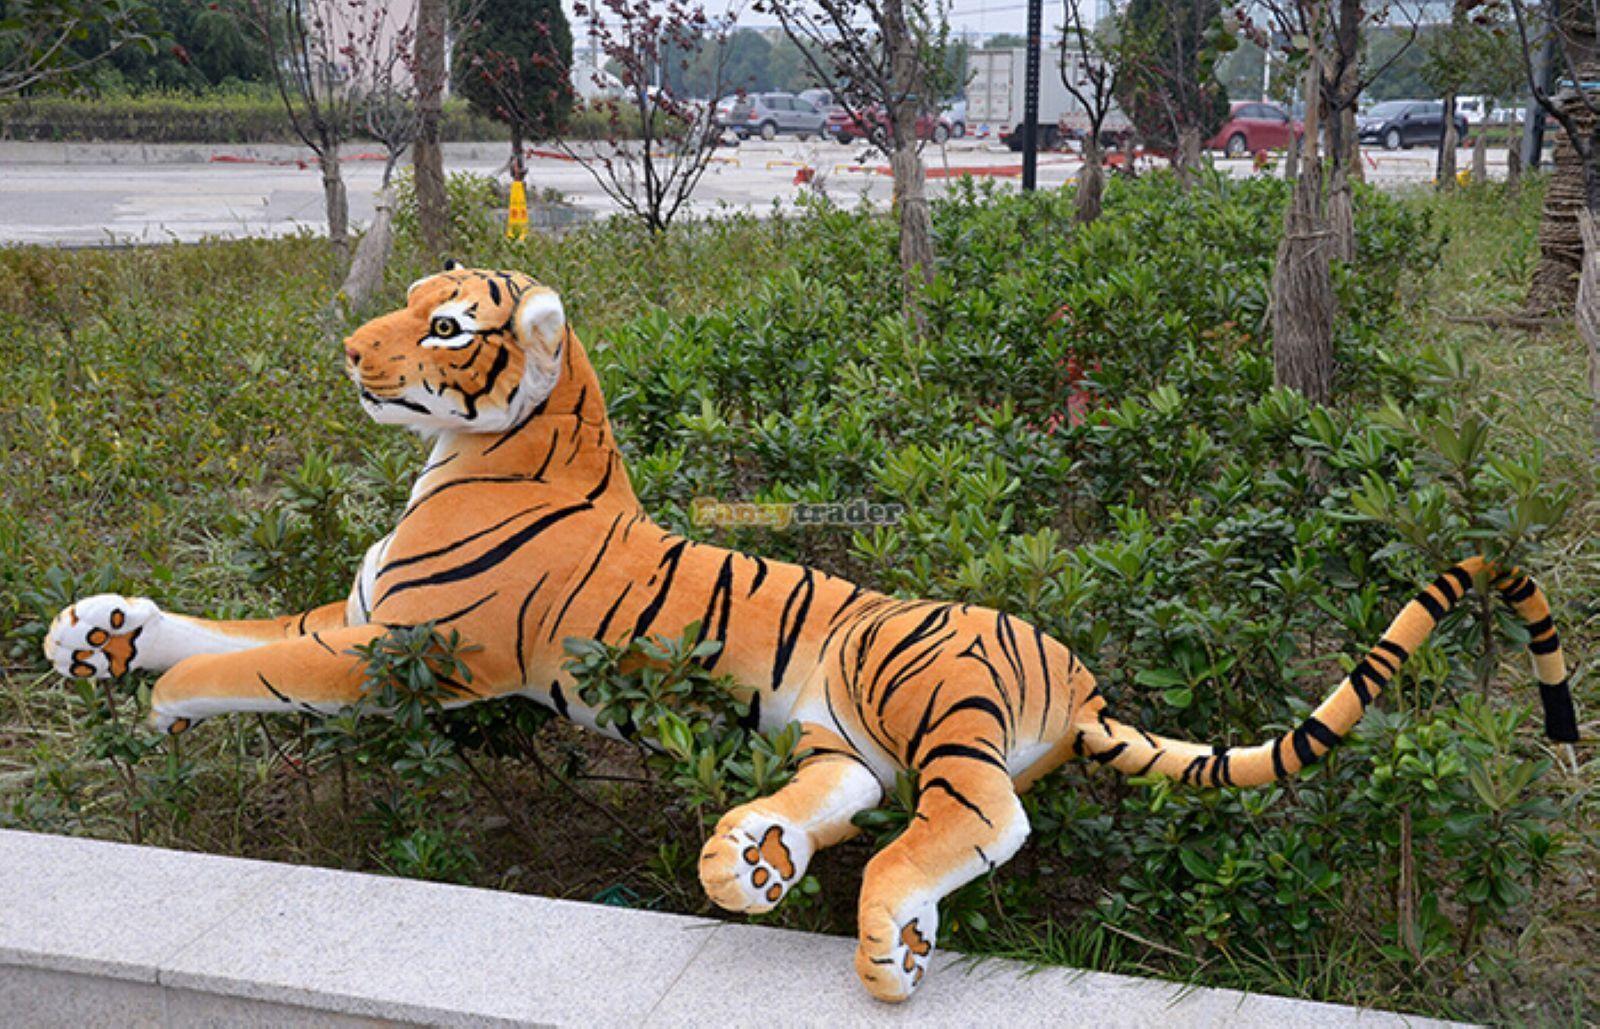 67'' Huge Giant Likelife Tiger Plush Stuffed Emulational Toys Animal doll gifts